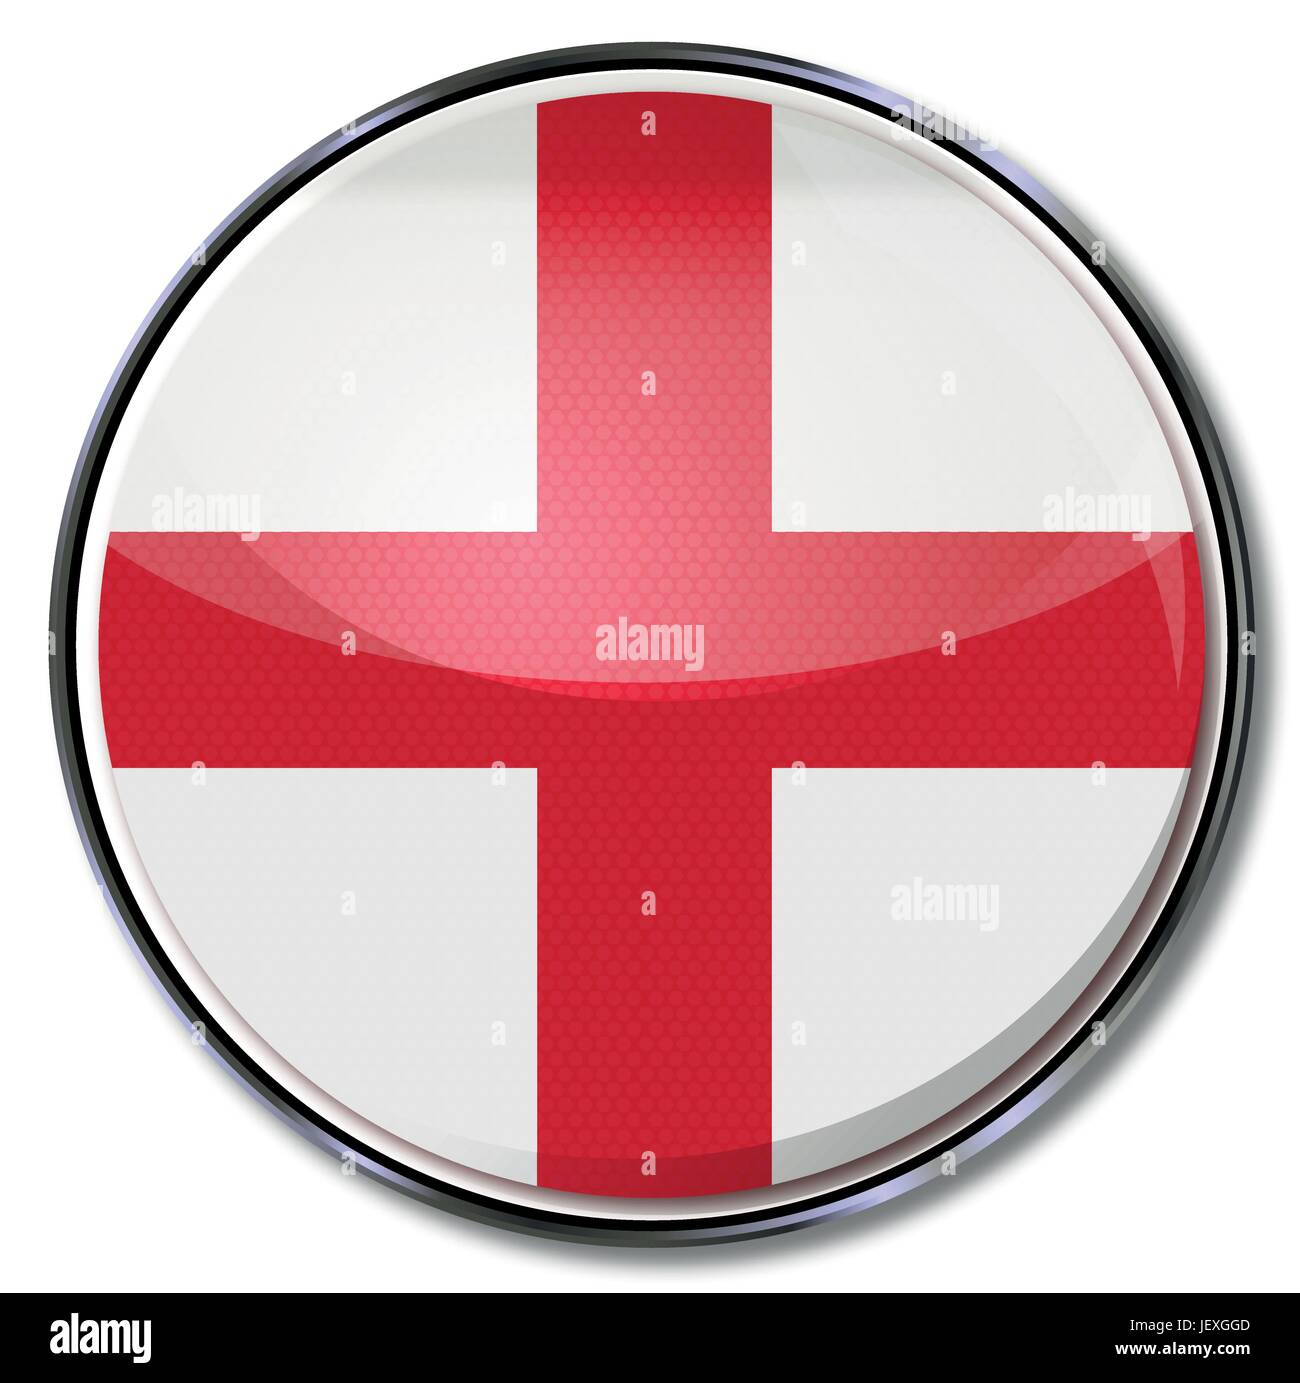 cross, england, flag, button, kingdom, unites, britain, cross, europe, angle, - Stock Image